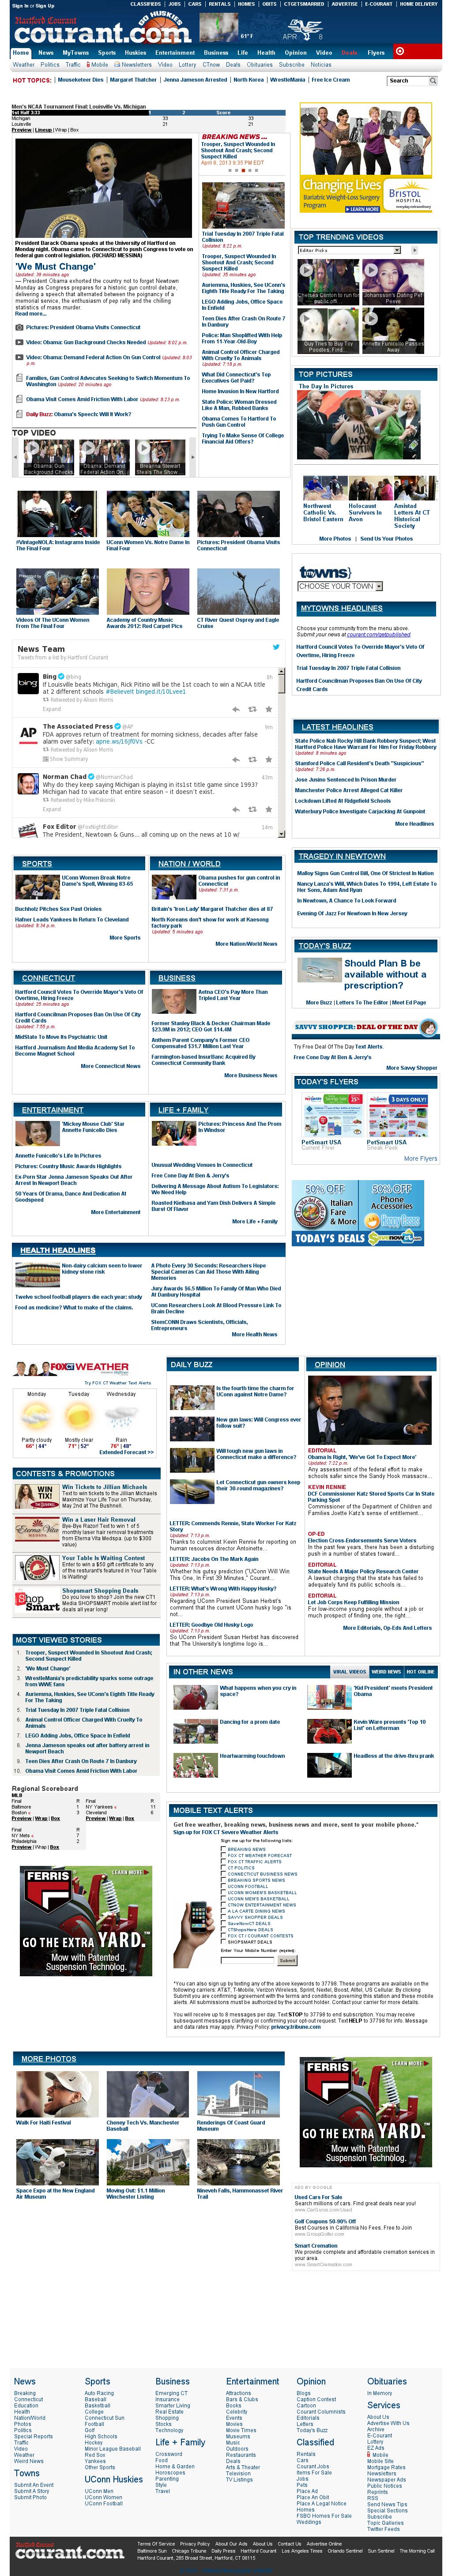 Hartford Courant at Tuesday April 9, 2013, 2:09 a.m. UTC